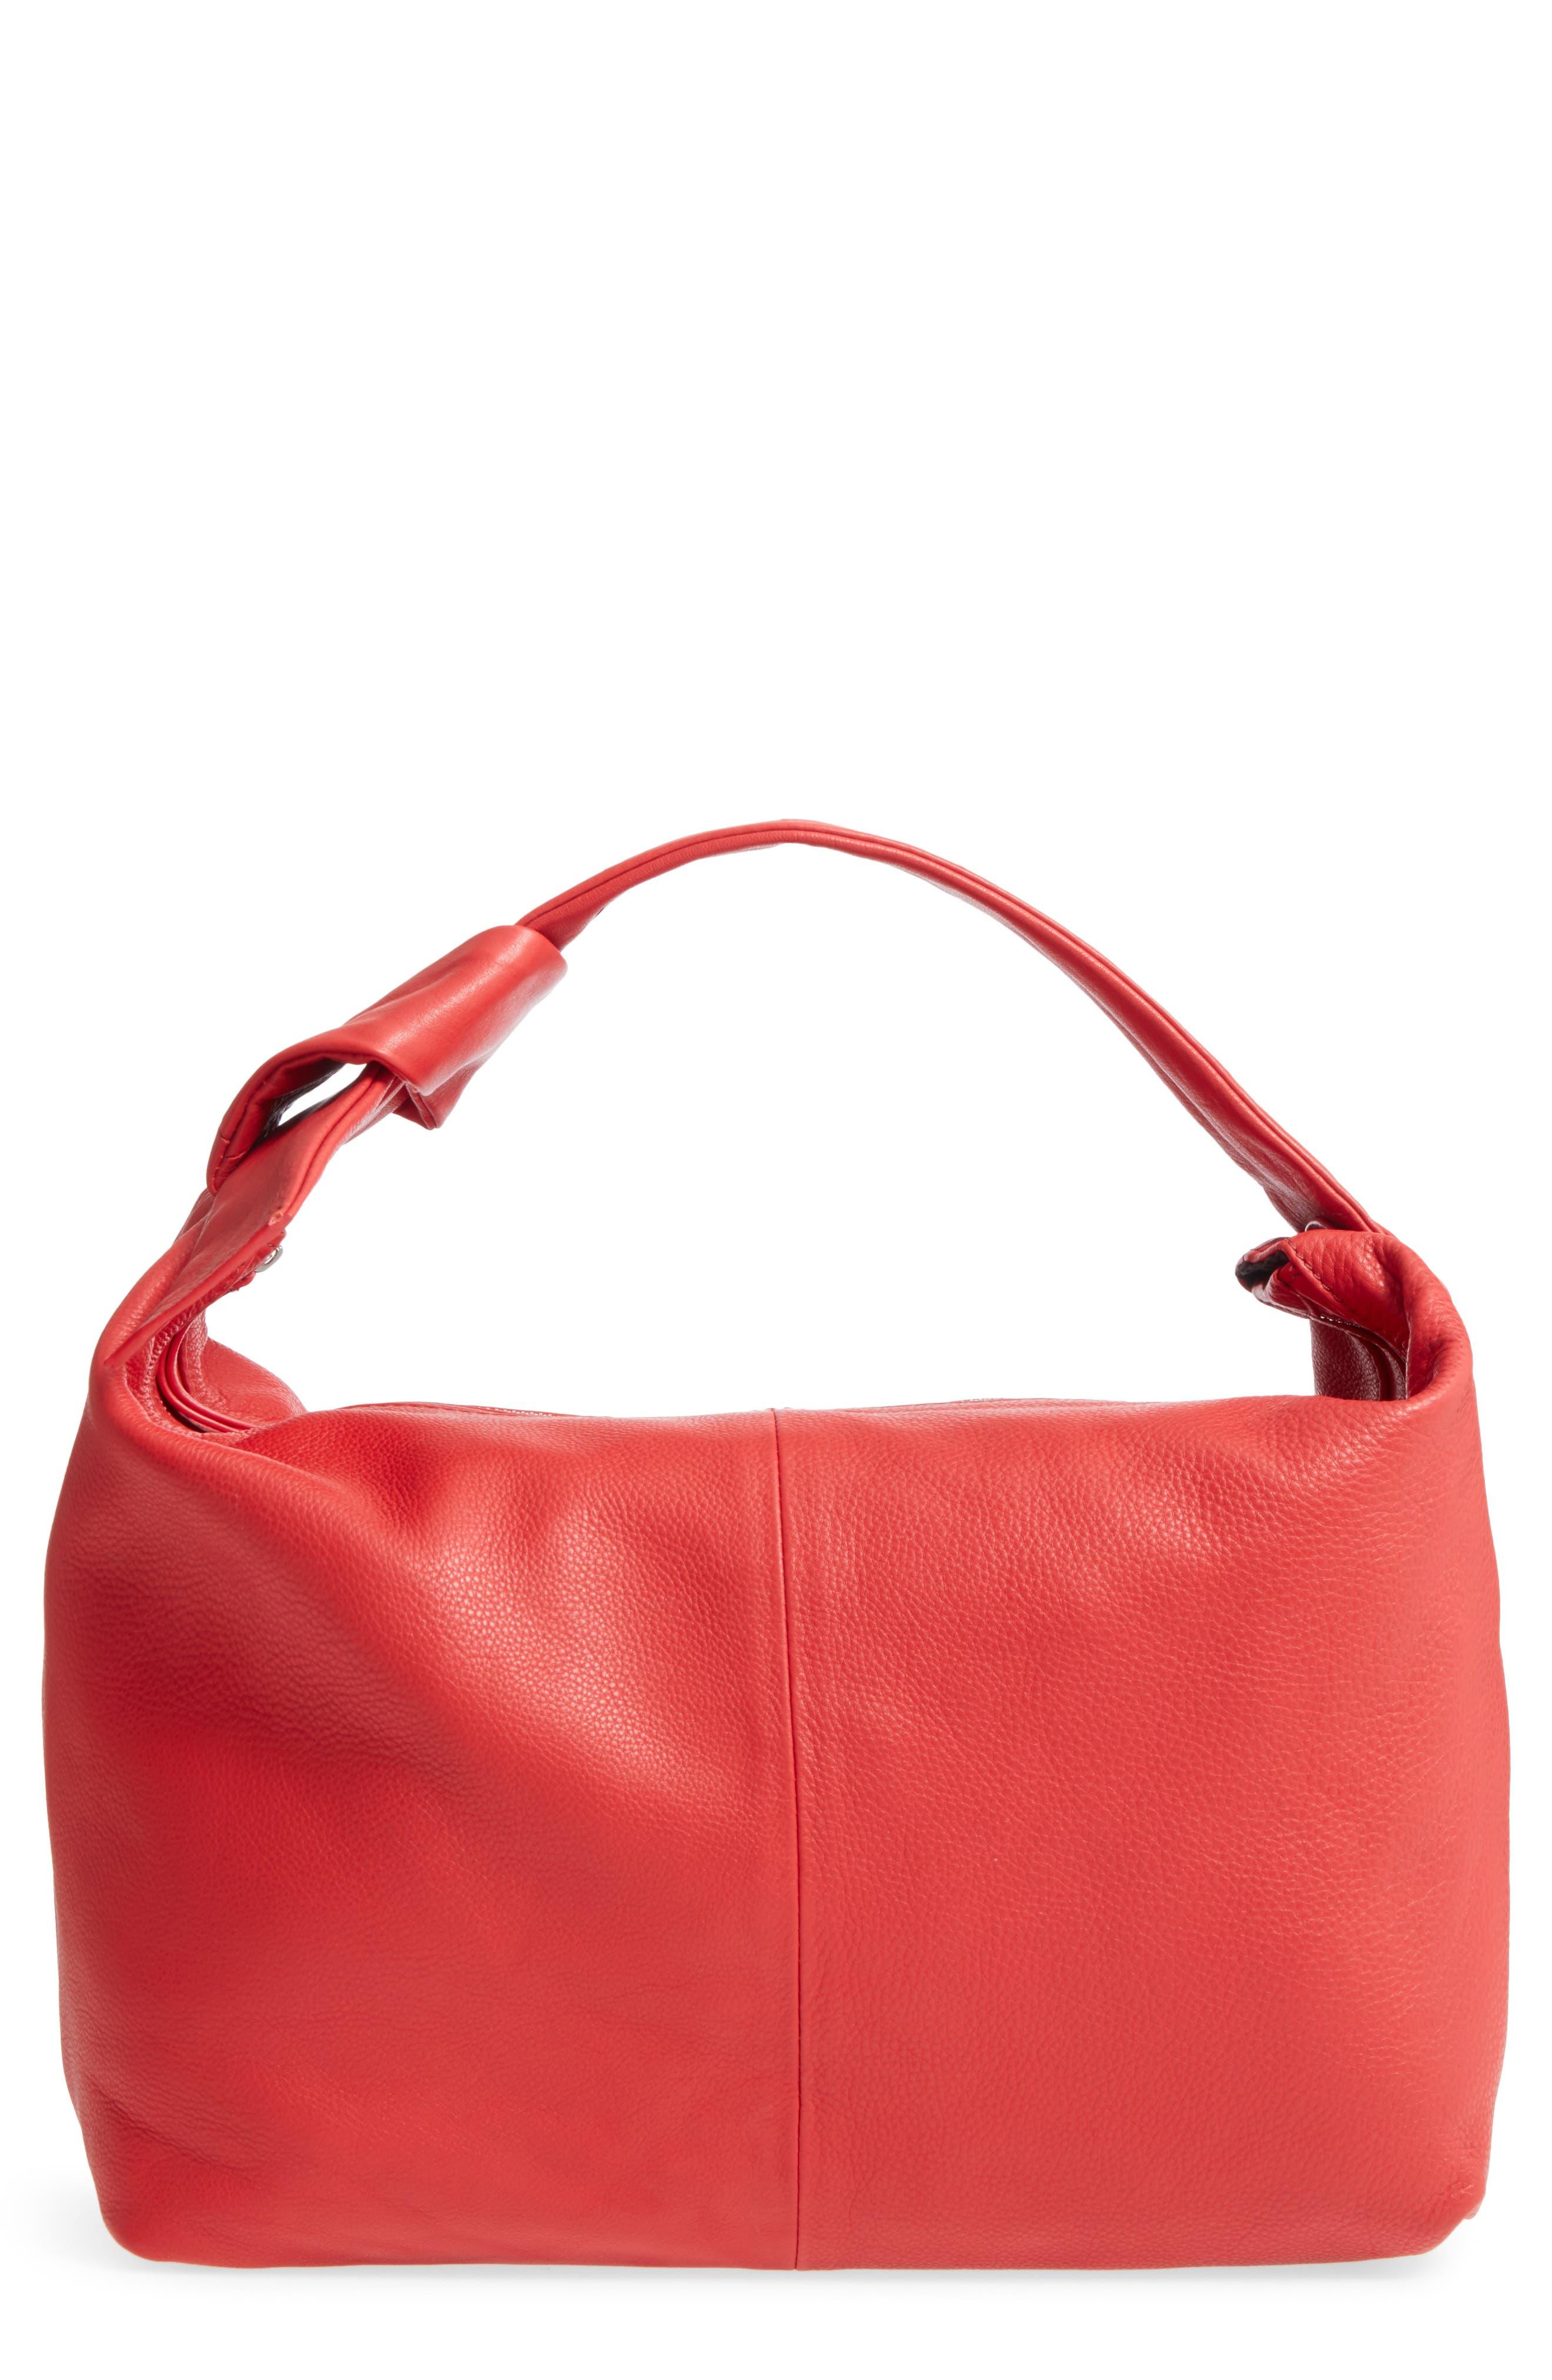 Premium Leather Jasmine Hobo Bag,                         Main,                         color, Red